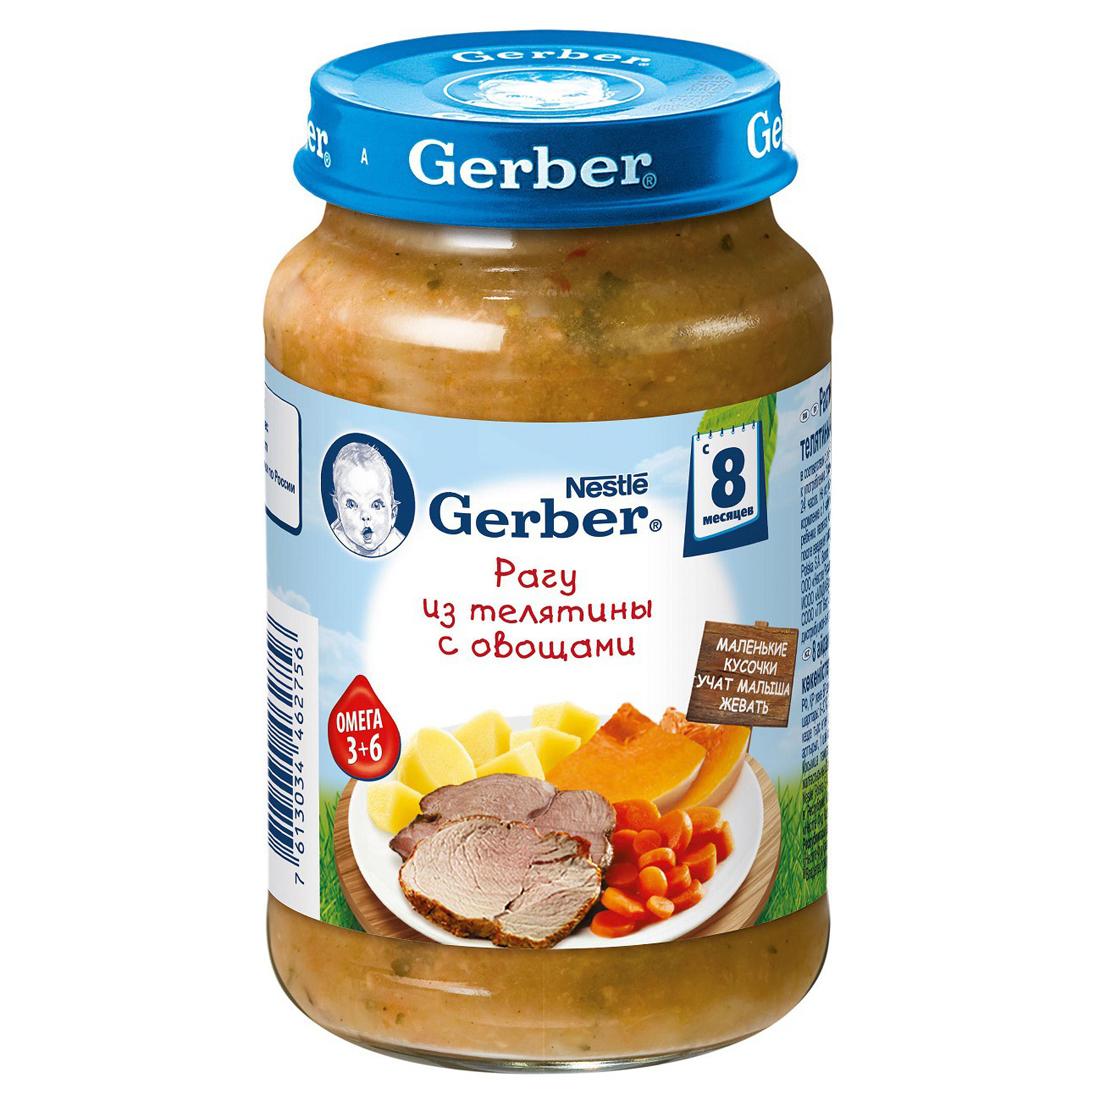 ���� Gerber ������ � ������� 190 �� ���� �� �������� � ������� (� 8 ���)